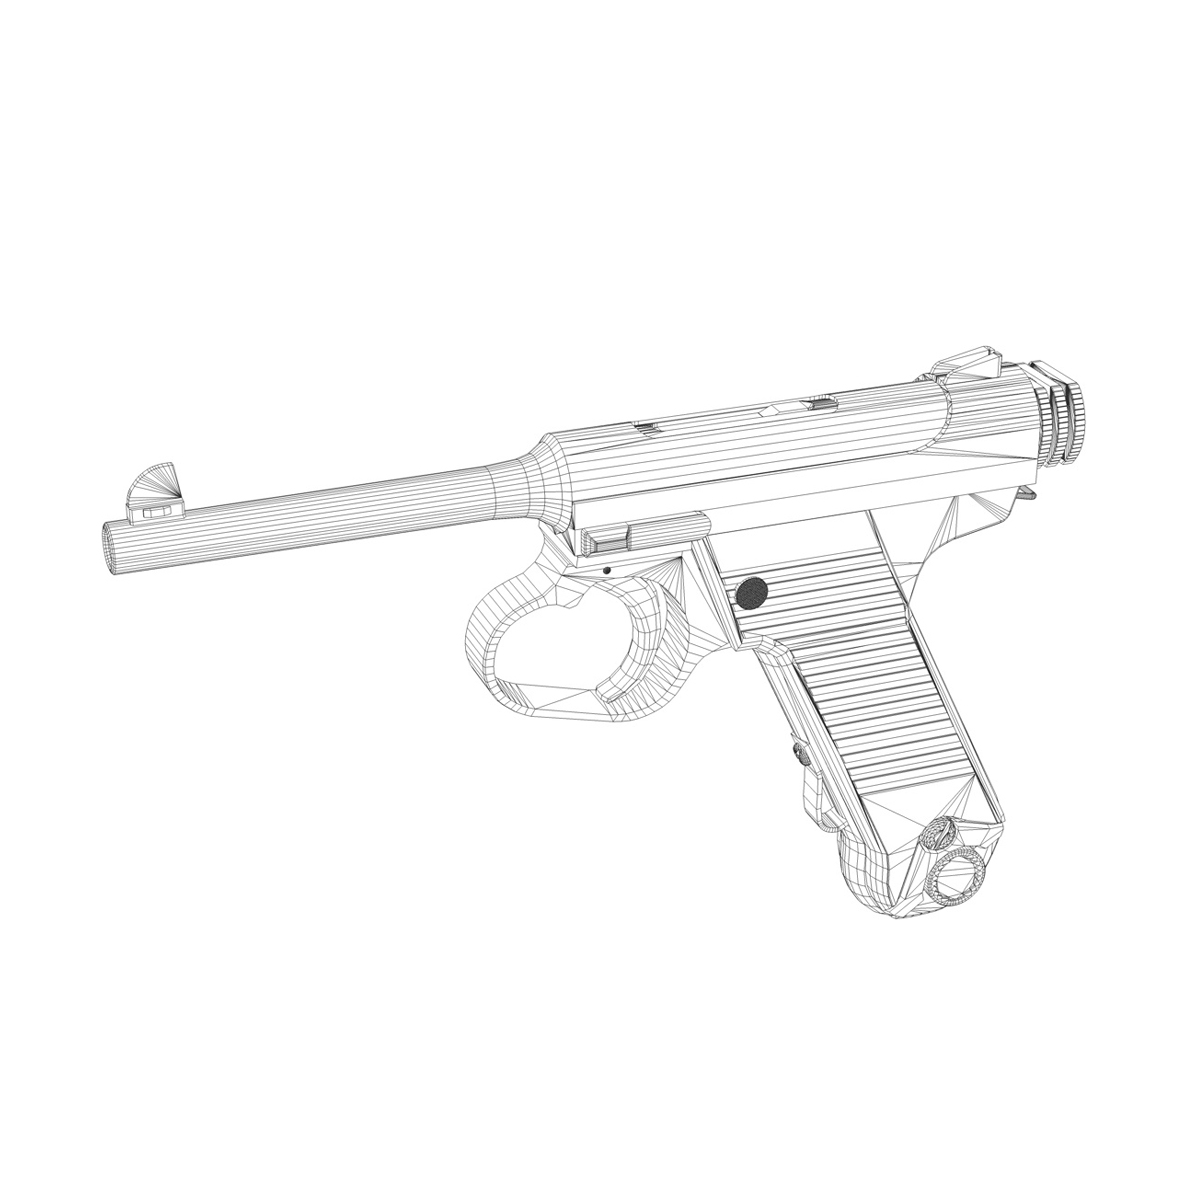 Nambu pištolj tip 14 3d model 3ds fbx c4d lwo obj 195159